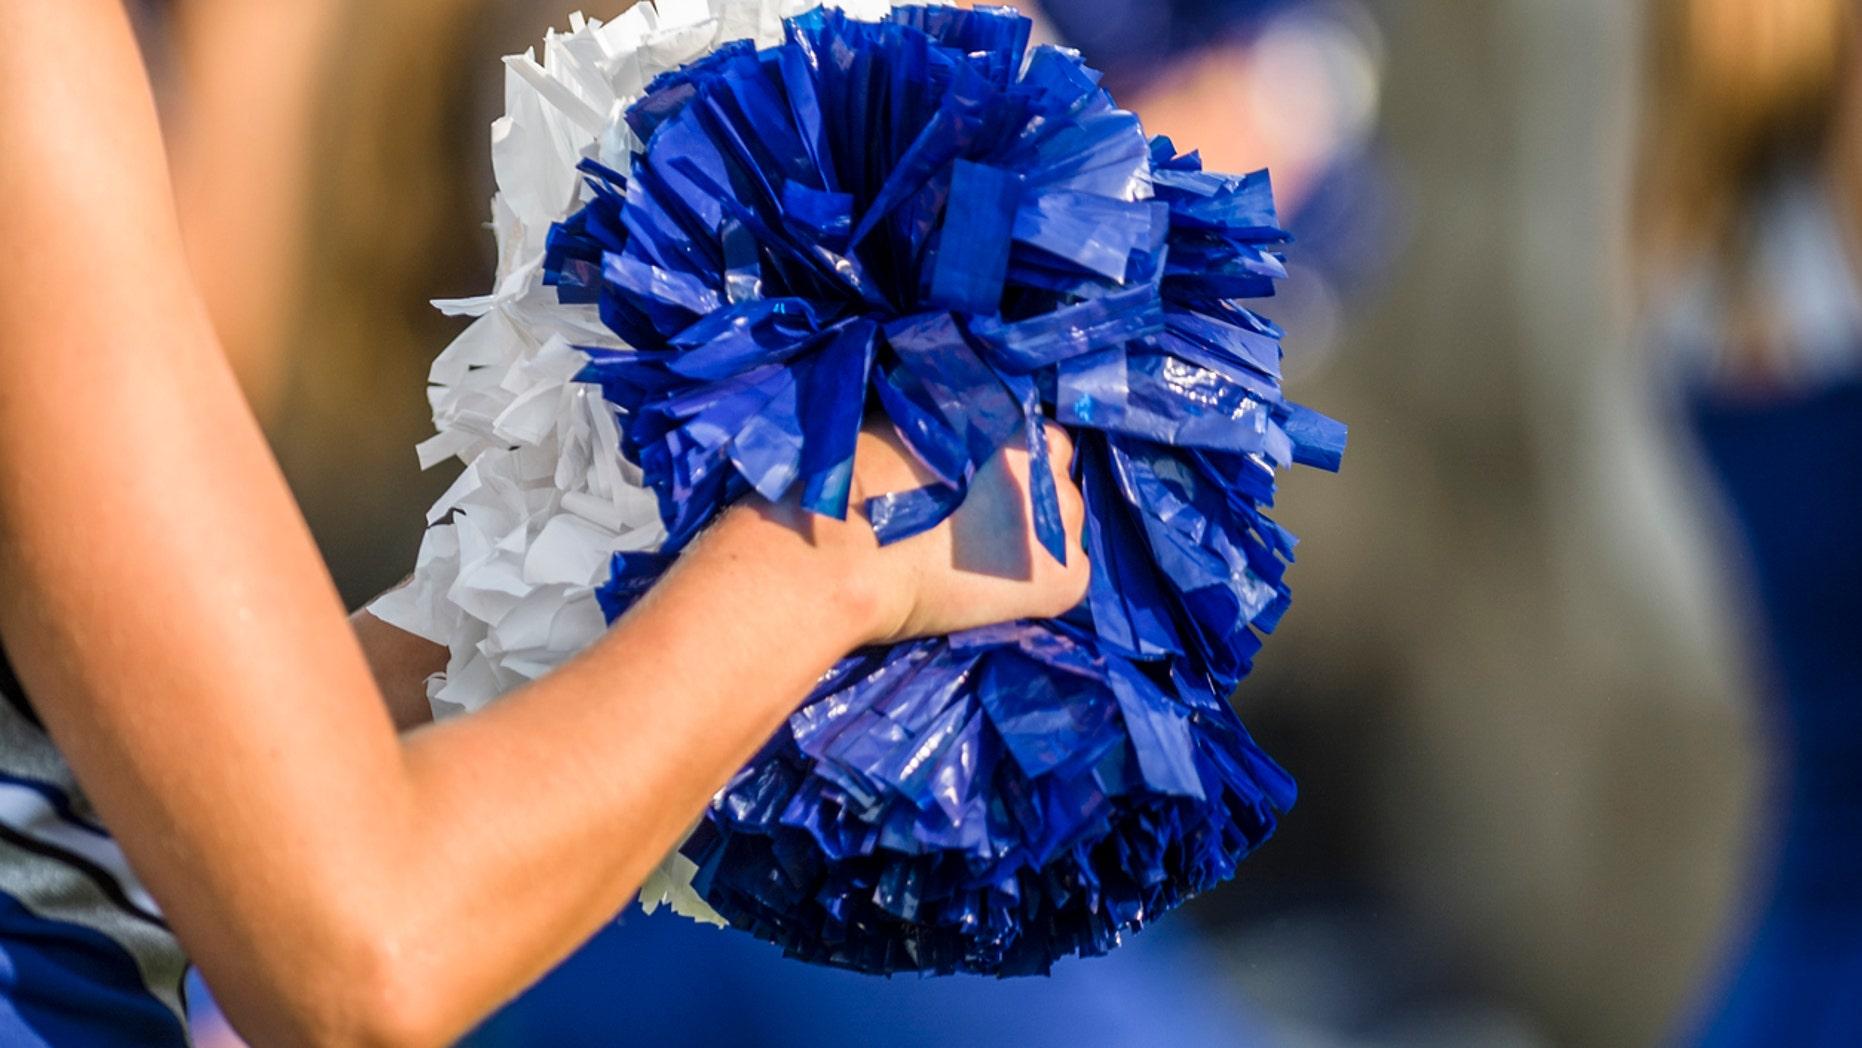 Cheerleader shaking blue and white pom poms